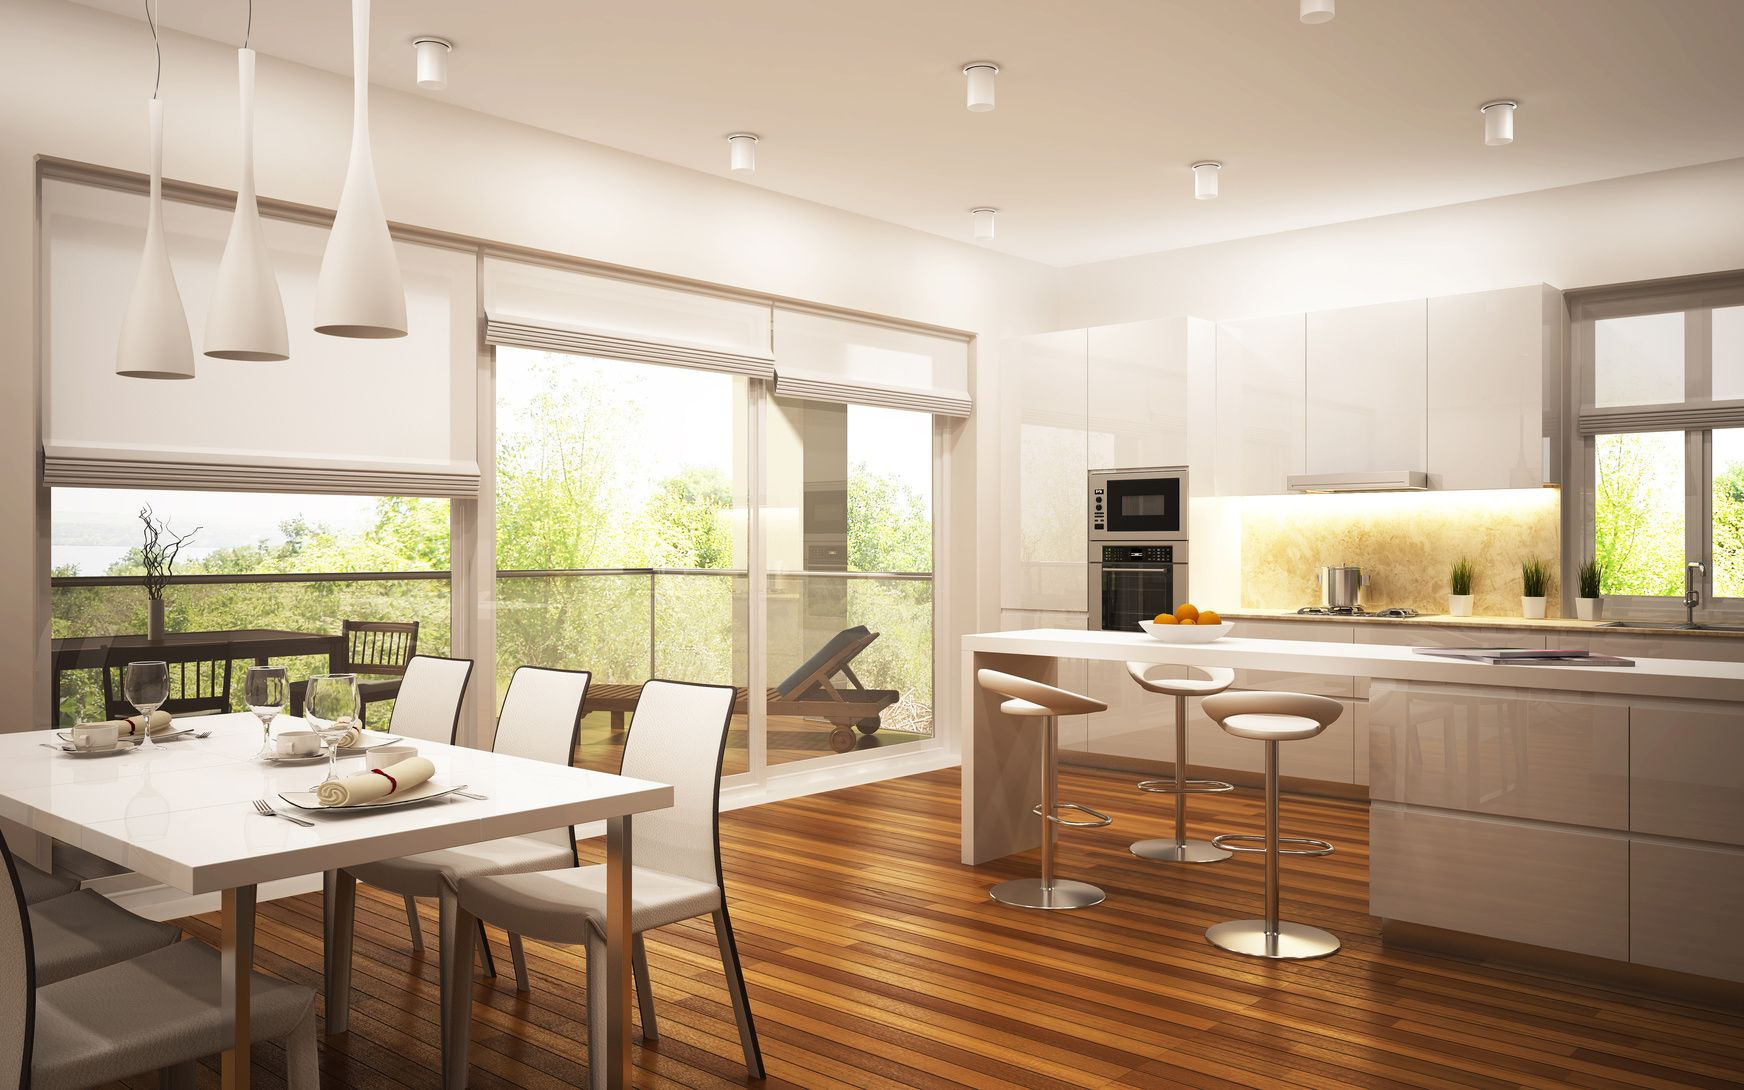 lampade sospese | bram_kitchen lighting nel 2019 ...